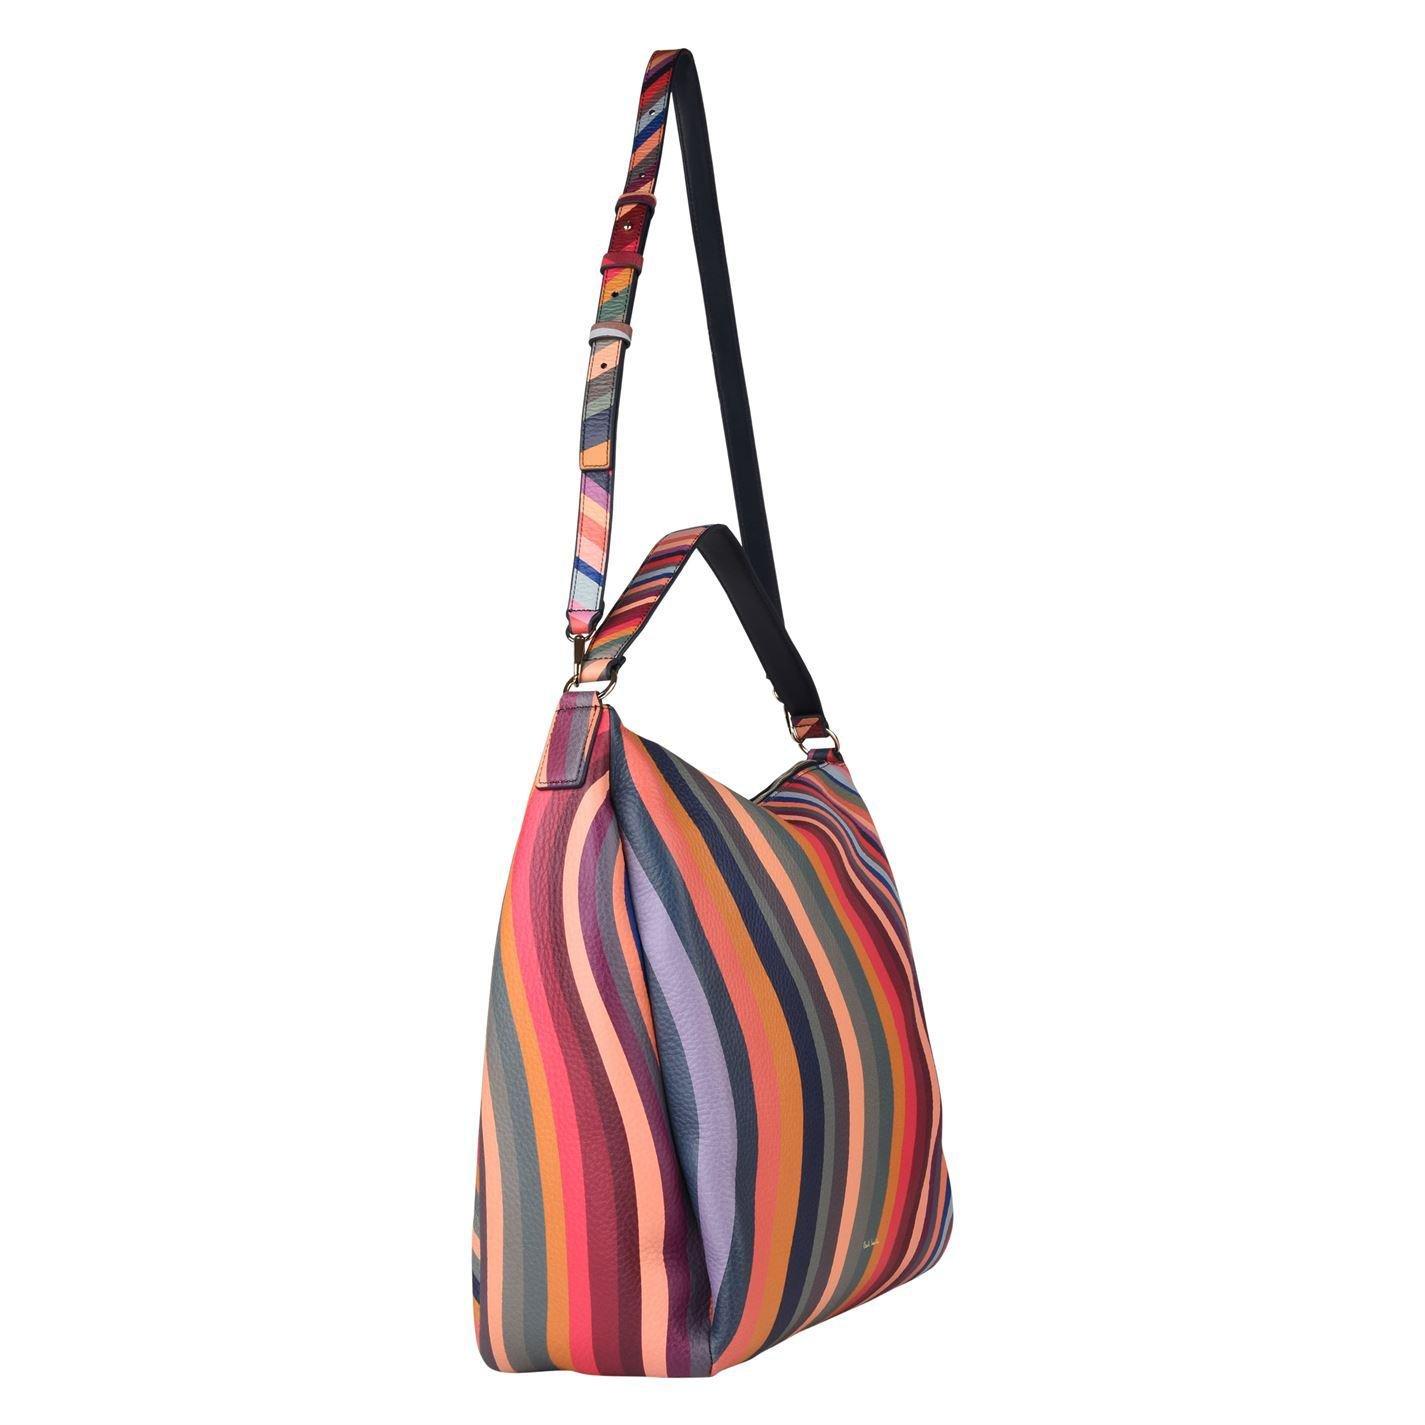 ... the latest f37fb c9c2e Paul Smith - Multicolor Swirl Zip Hobo Bag -  Lyst. 45e43b2449382